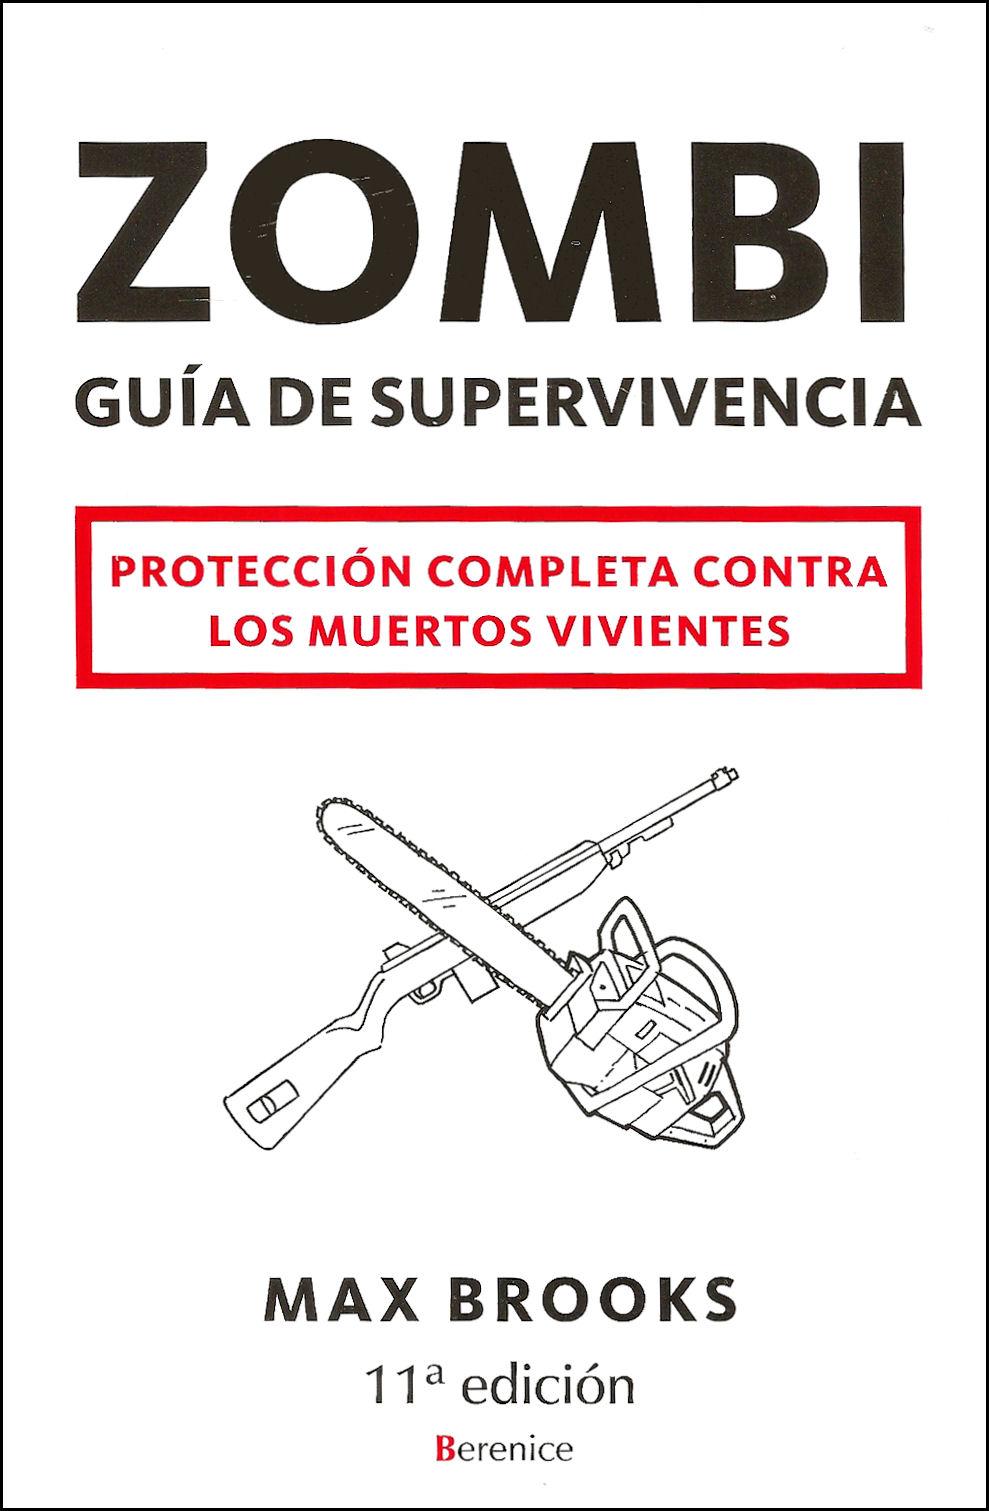 ¿Qué estás leyendo? Zombi-guia-de-supervivencia4